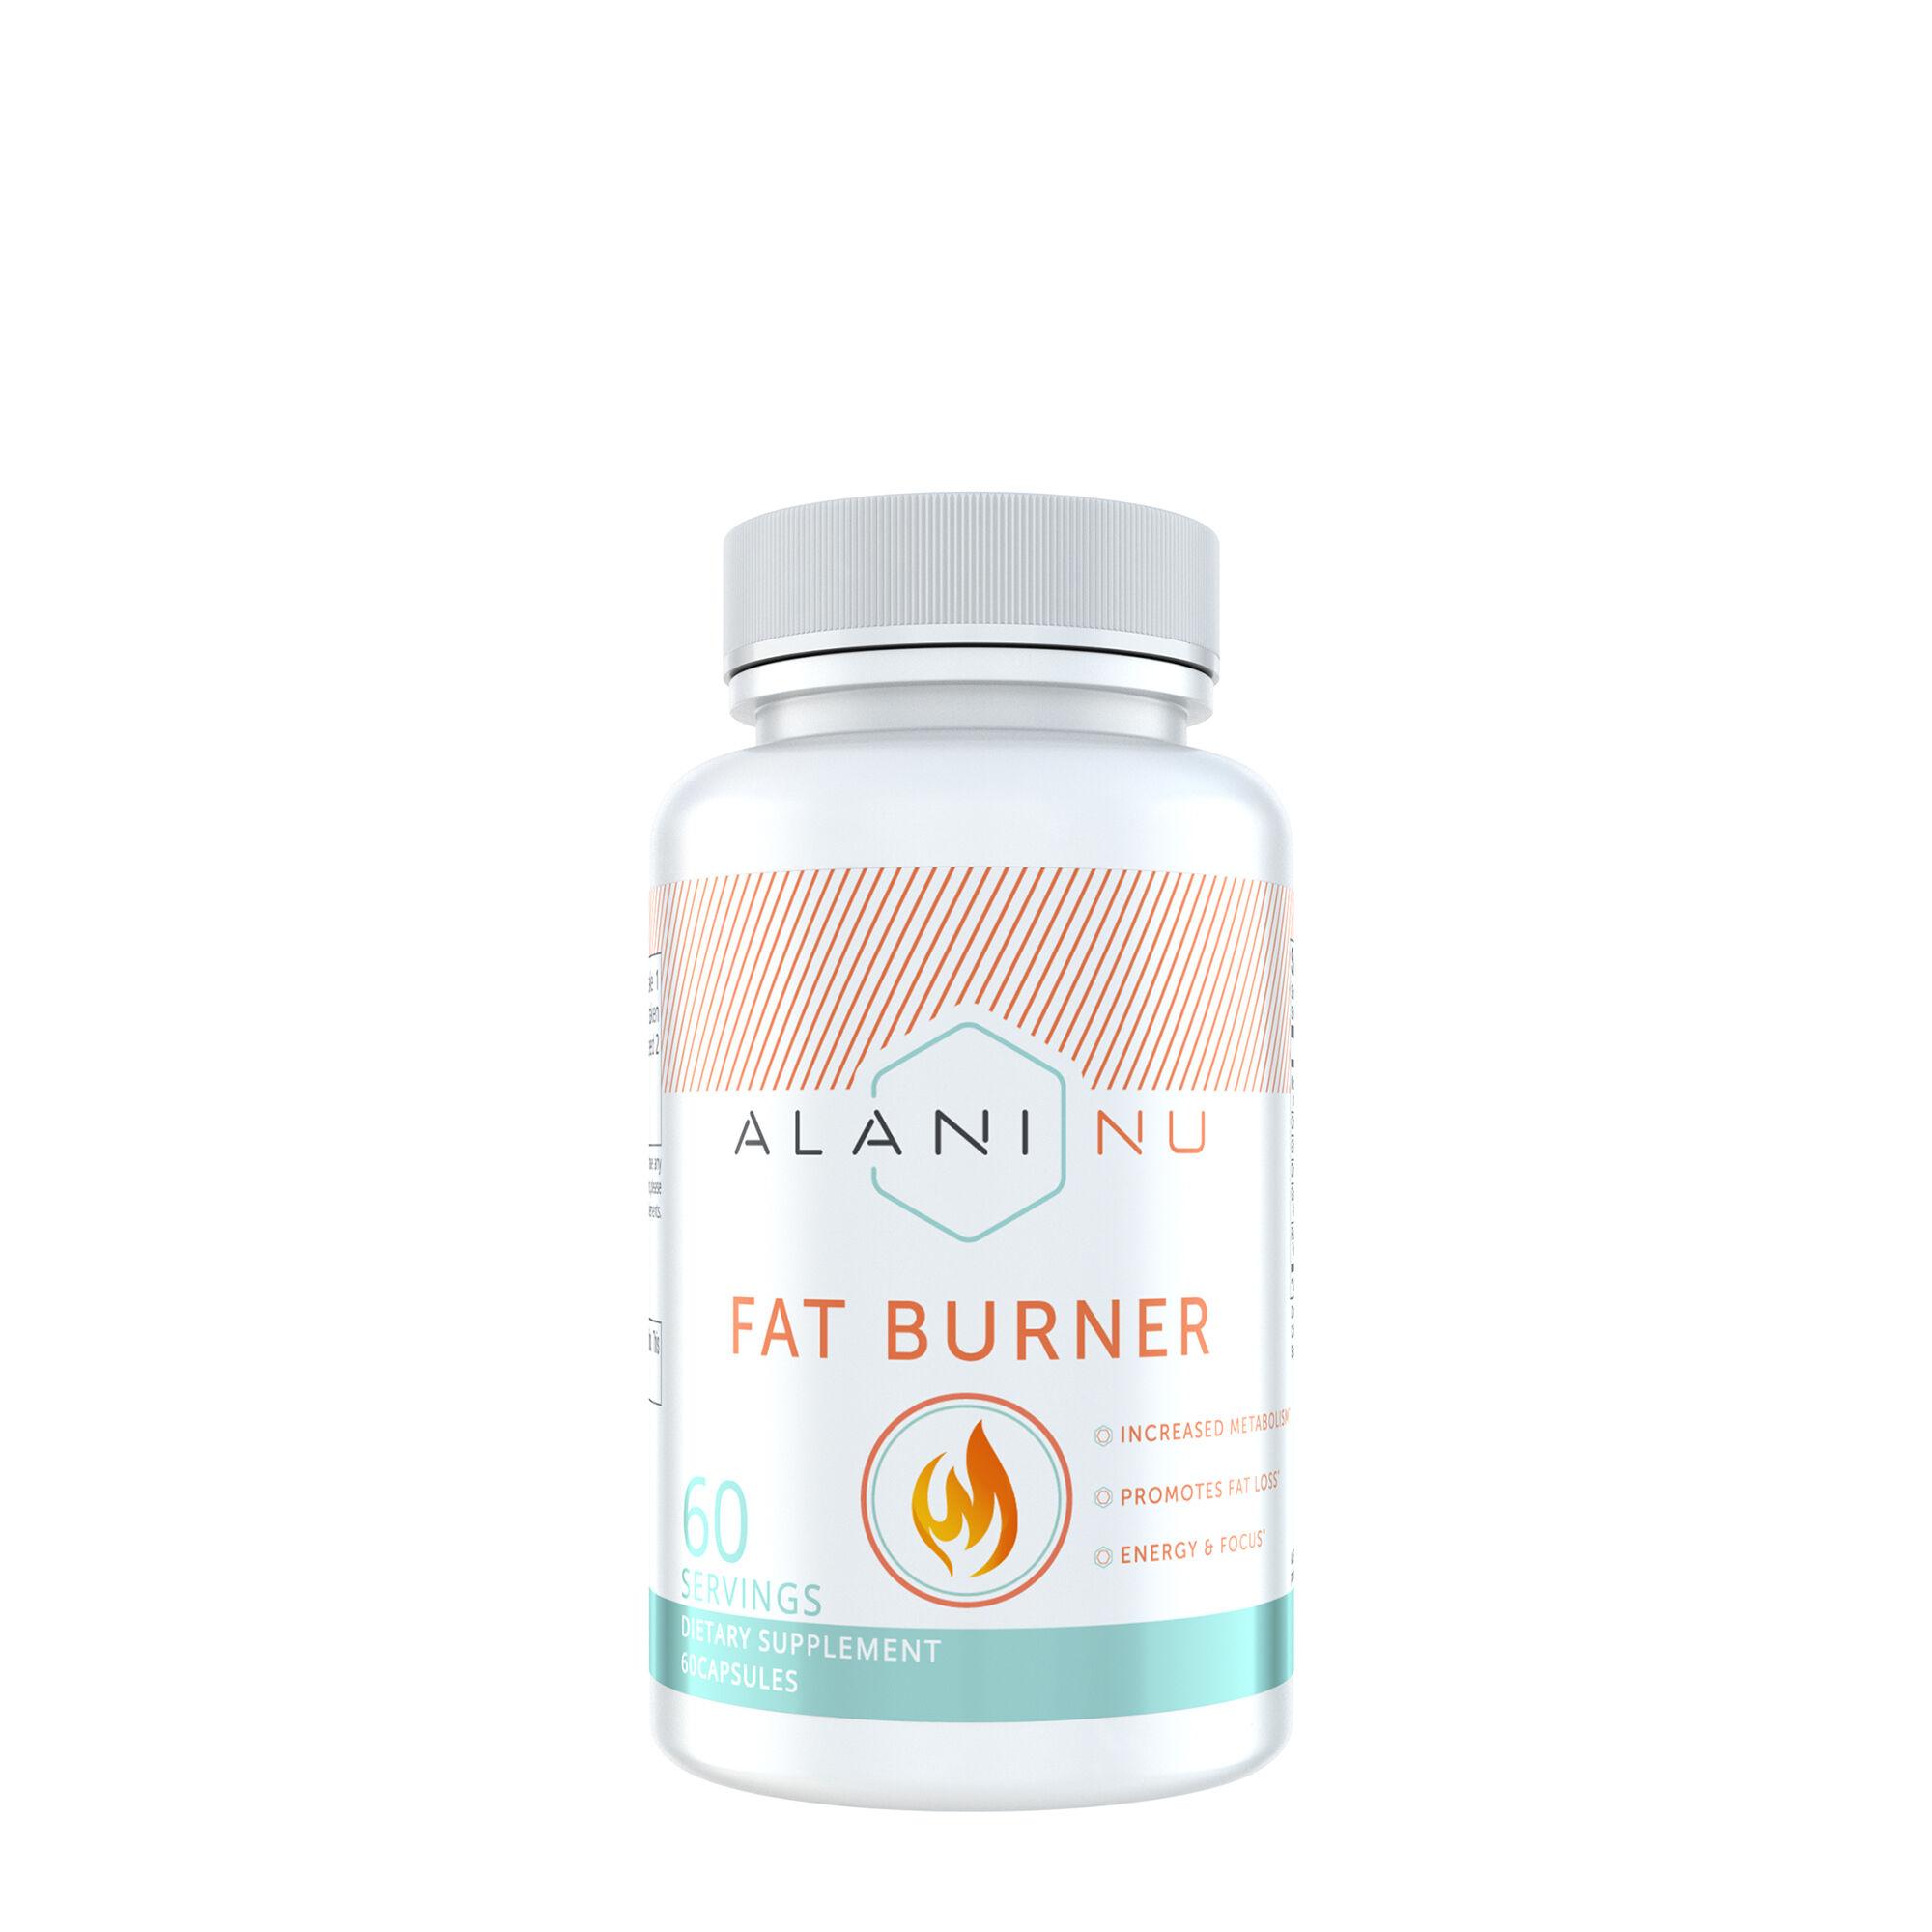 Burn fat burner gnc